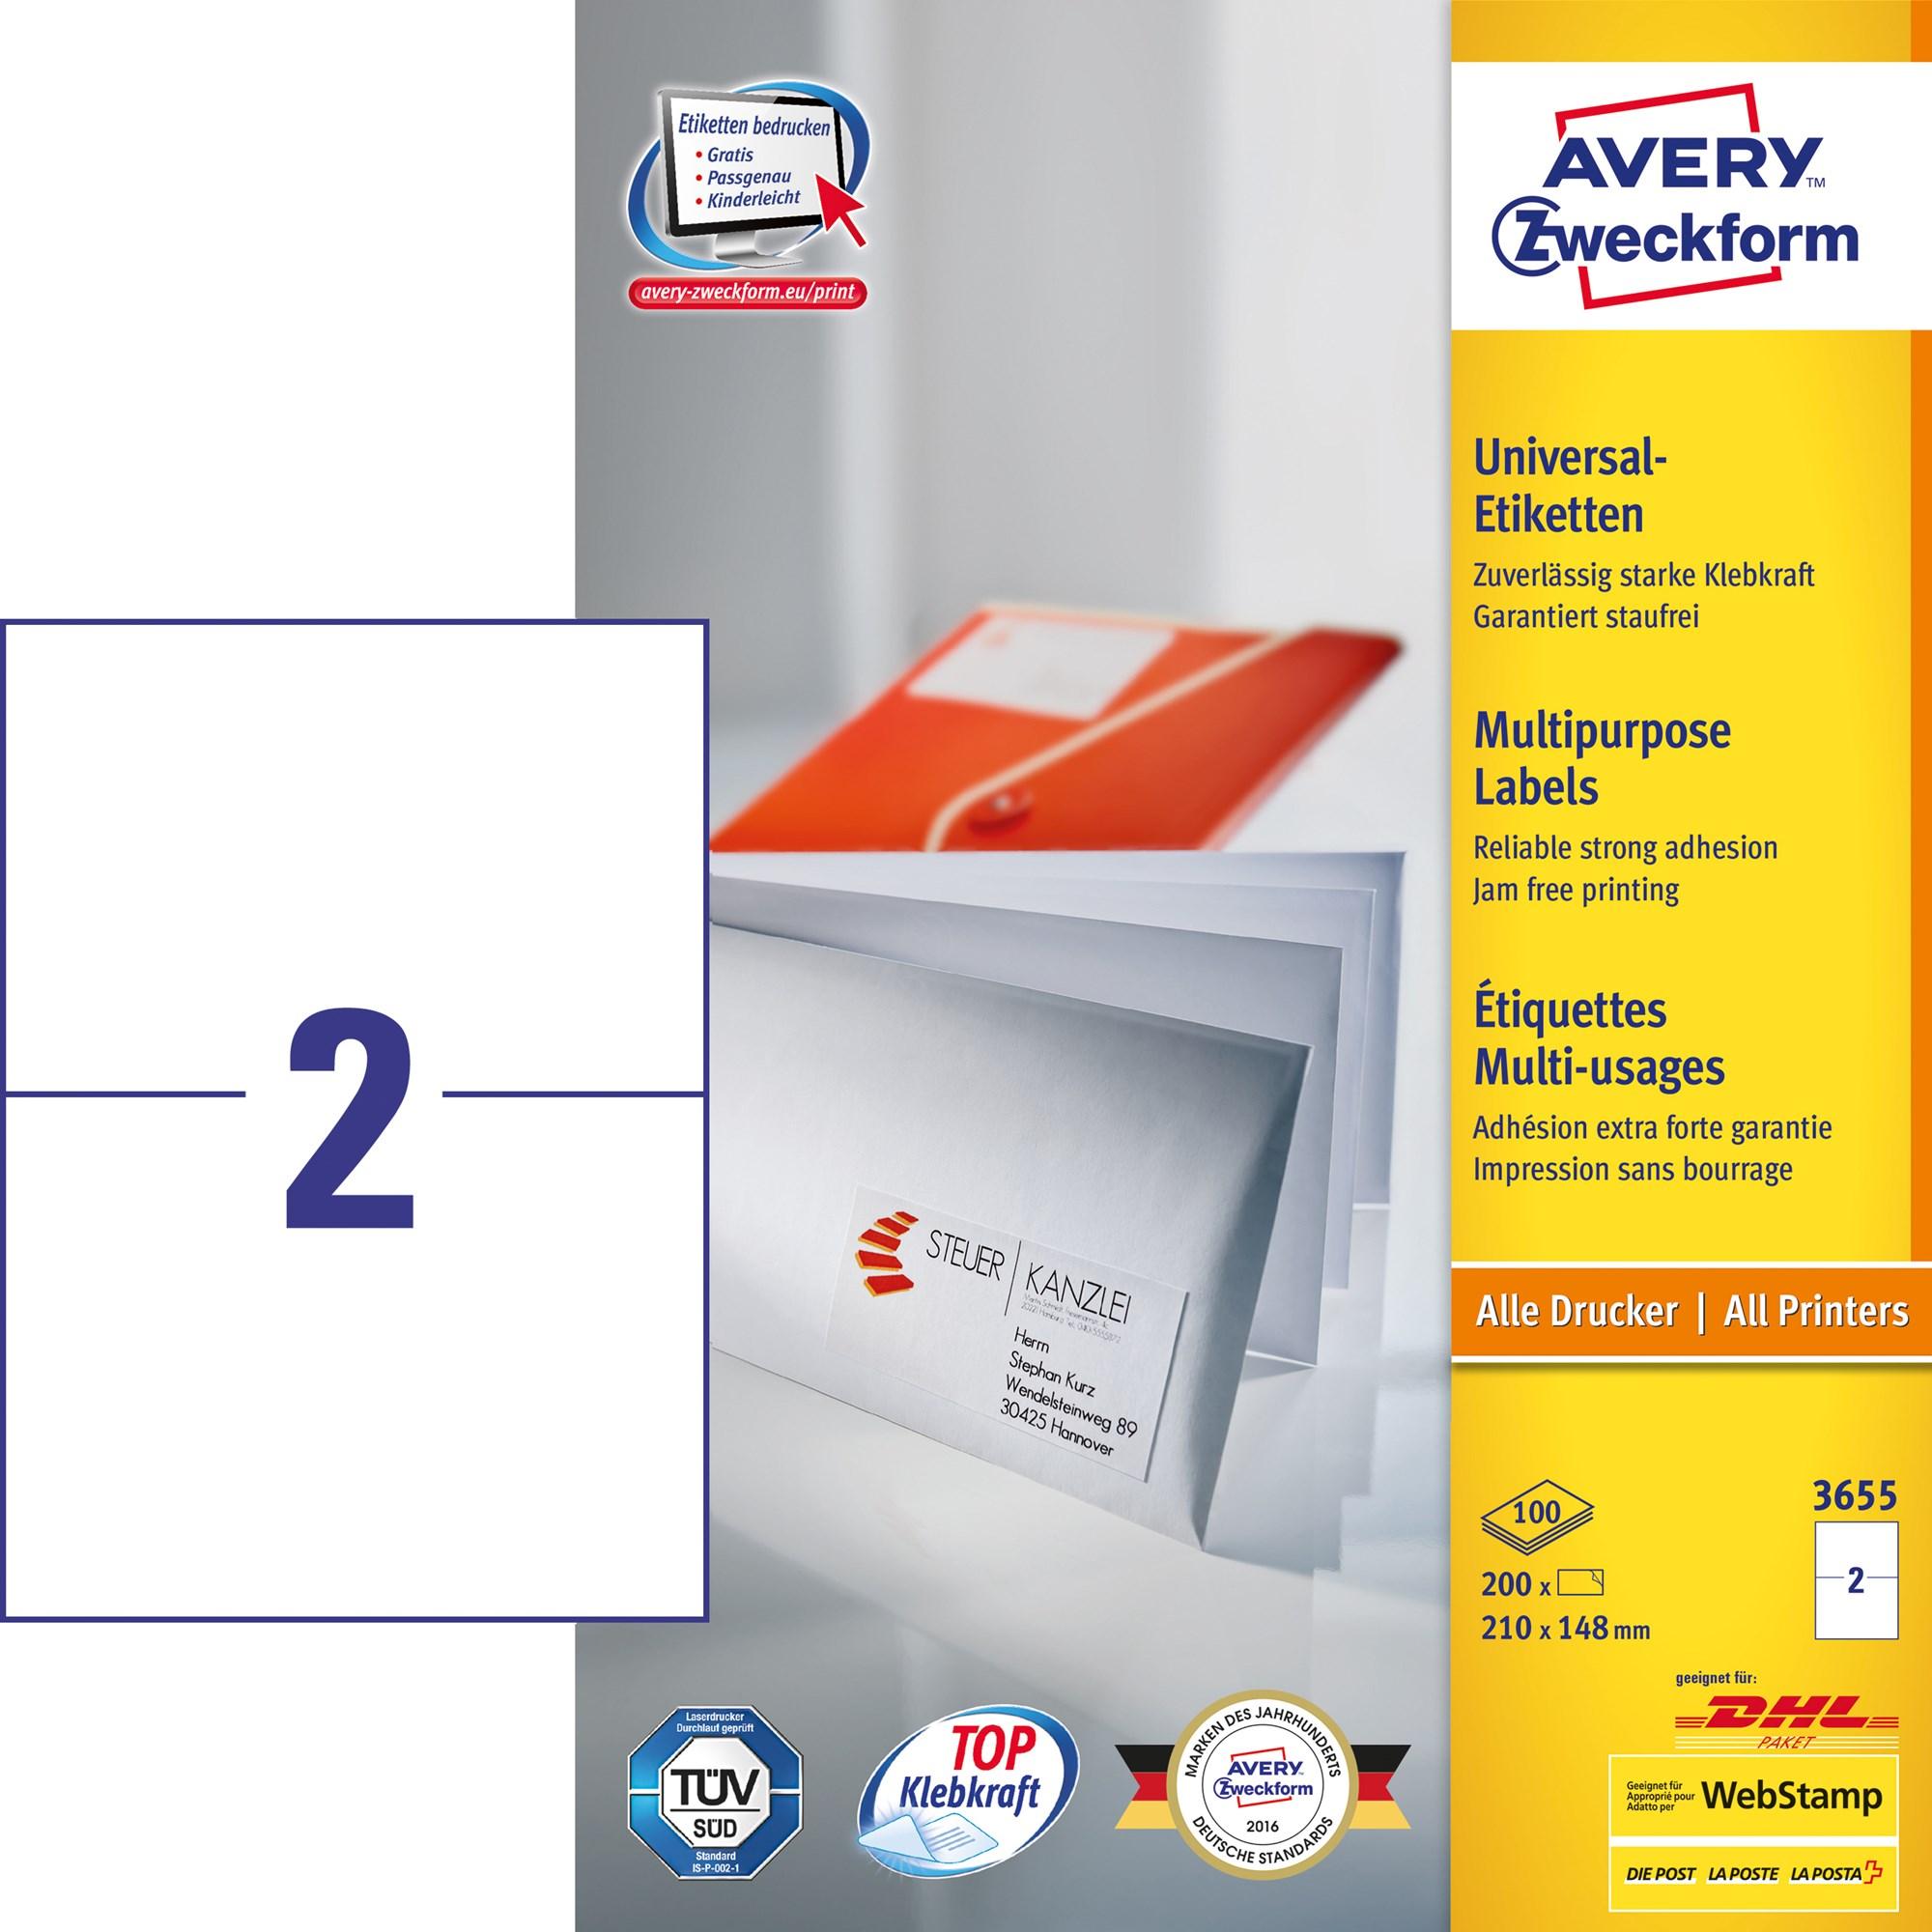 Image of Avery ILC universal etiket 210x148mm (200)